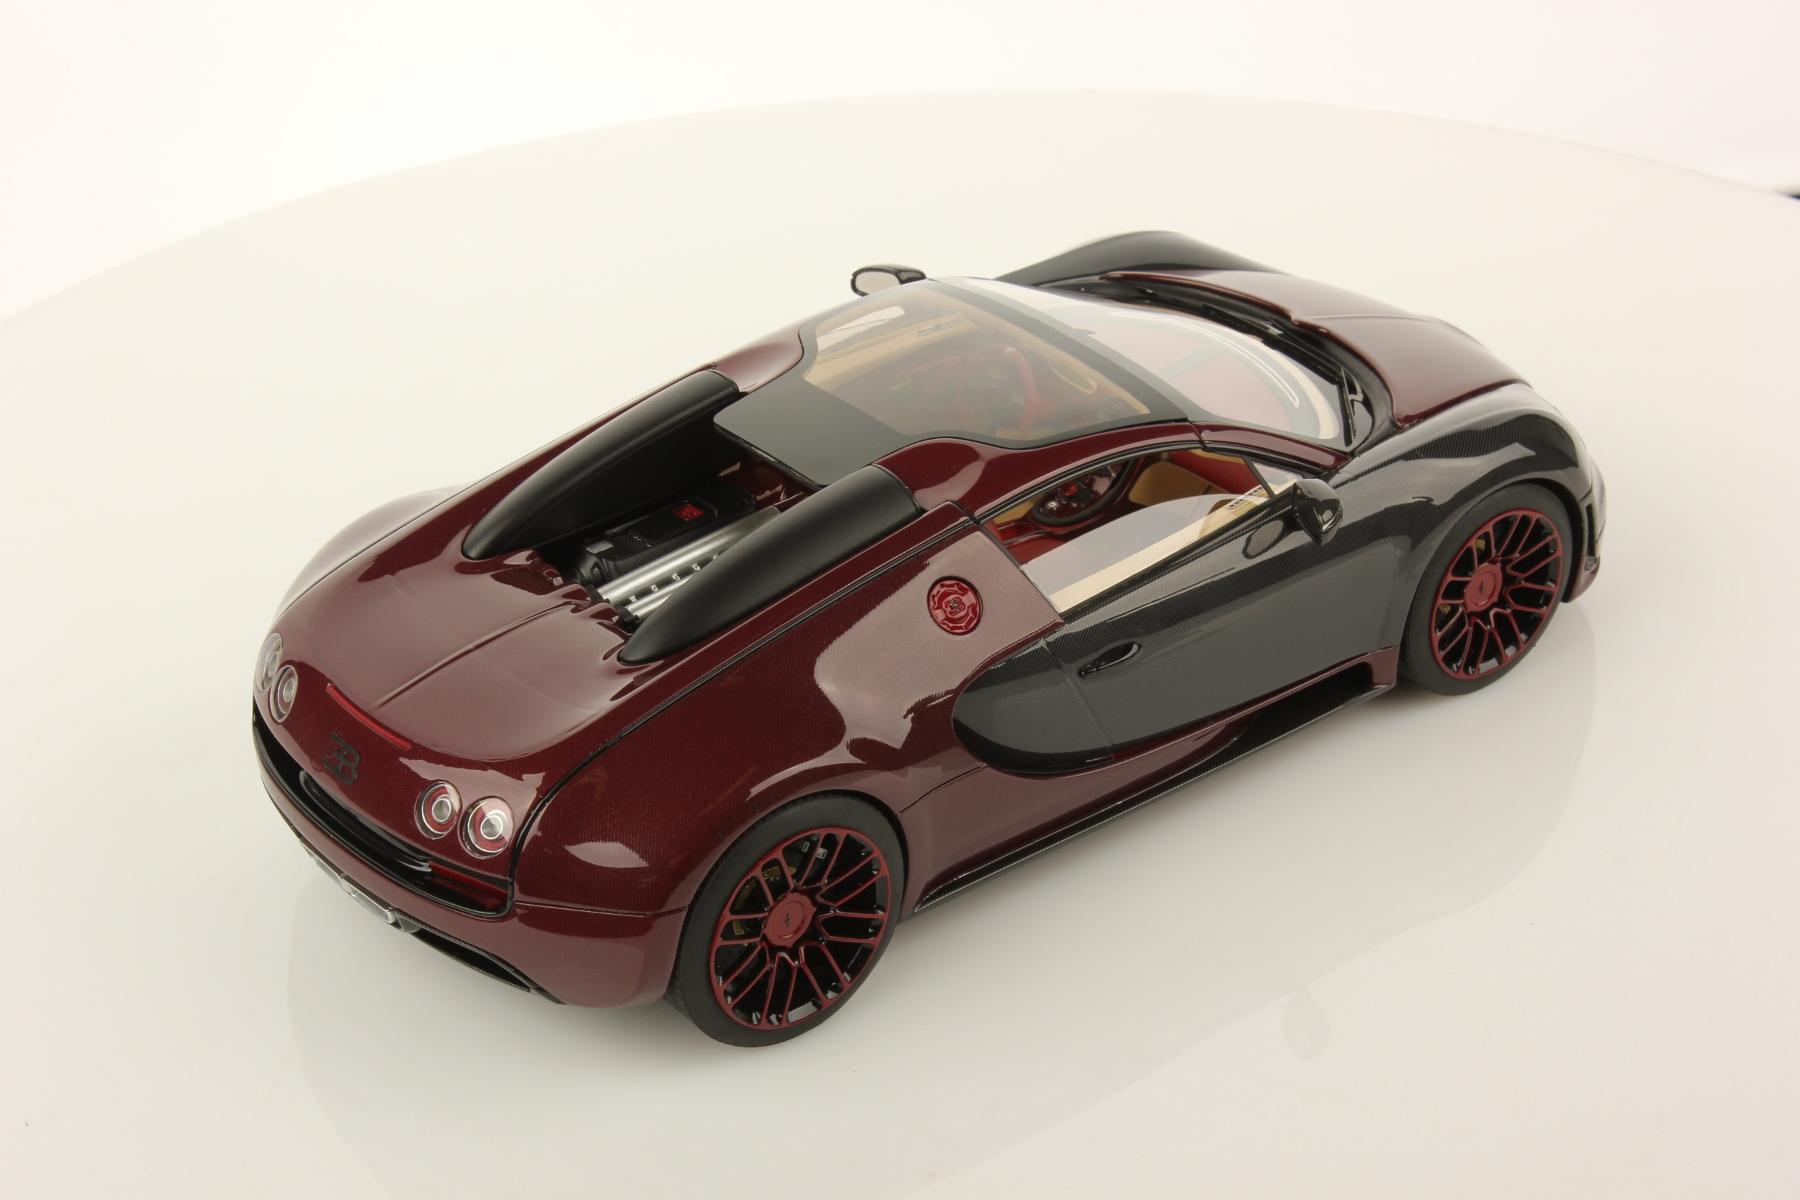 IMG_7163-1800x1200 Interesting Bugatti Veyron Grand Sport Vitesse Vs Pagani Huayra Cars Trend